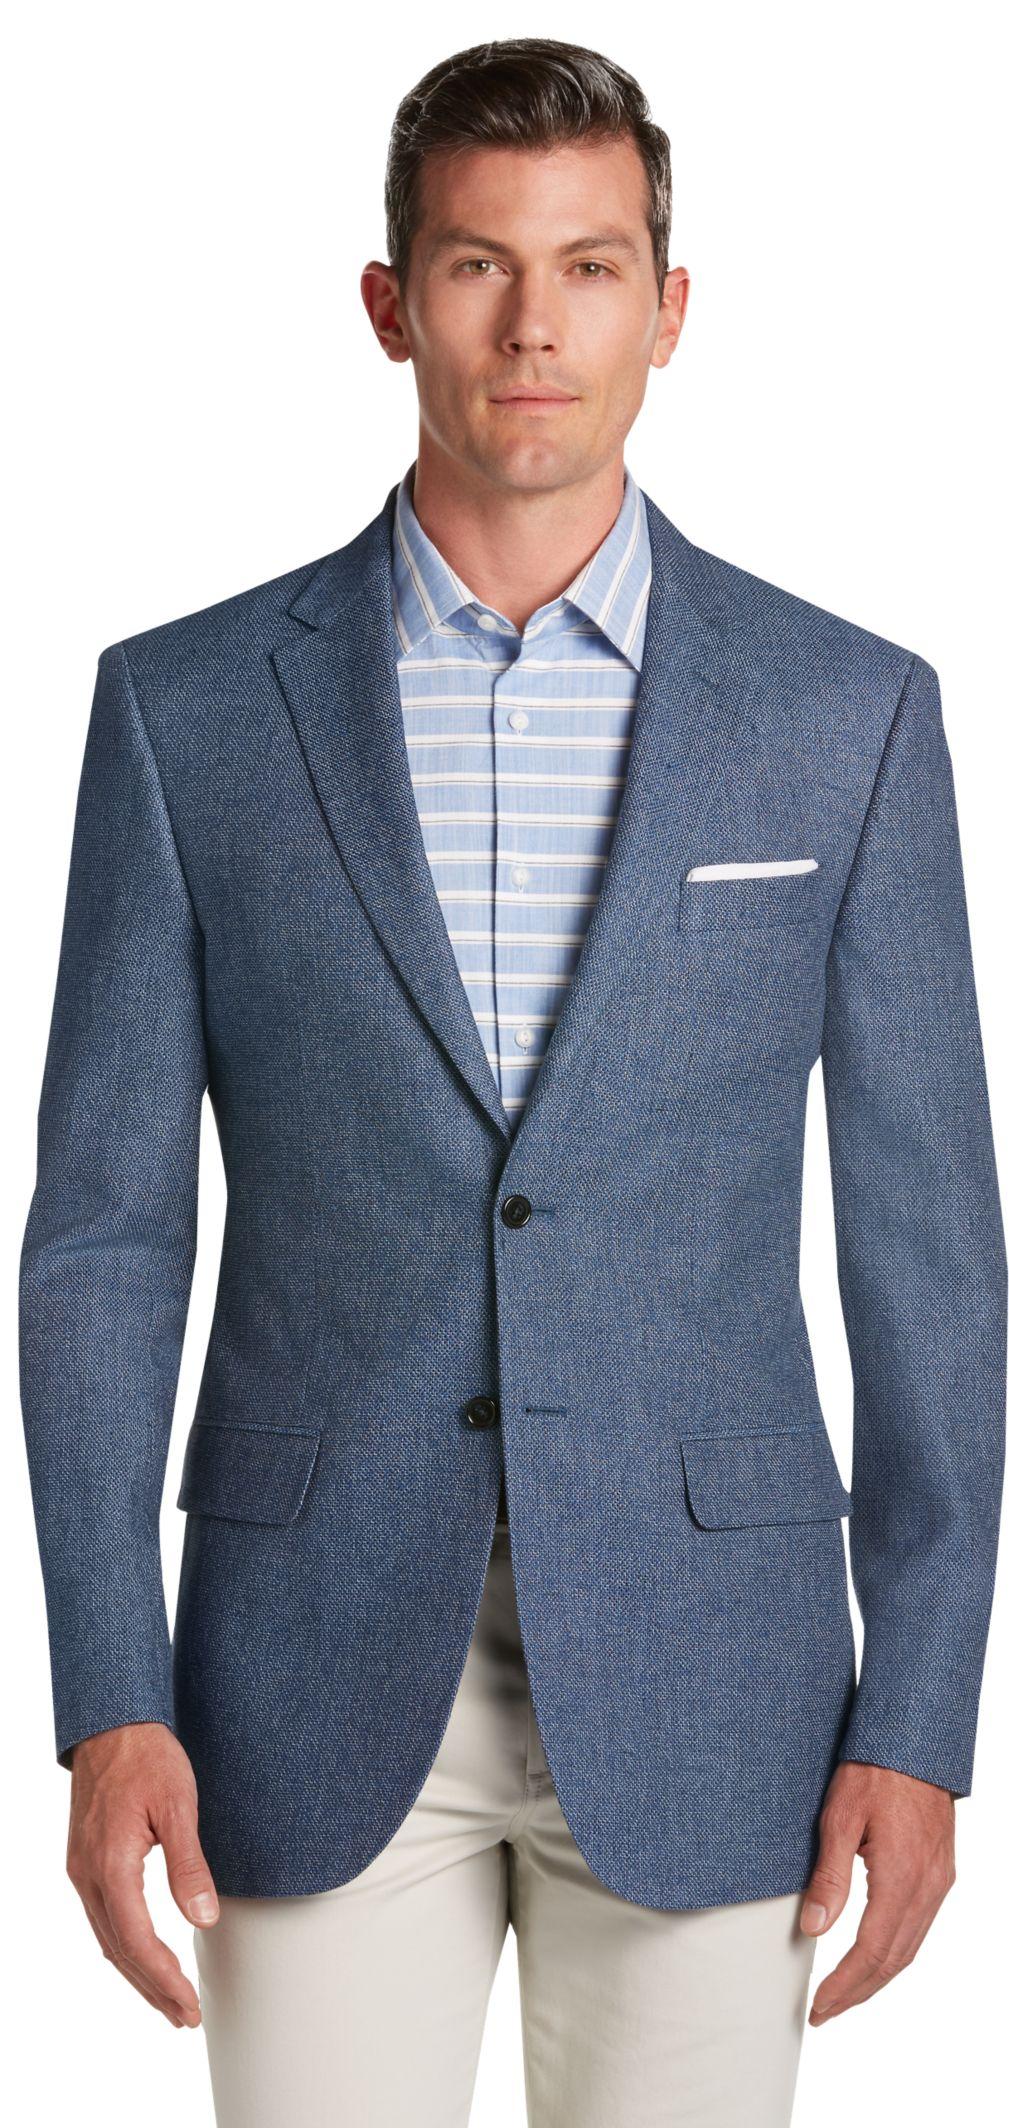 Men's Suits Clearance | Discounts   Sales | JoS. A. Bank Clothiers